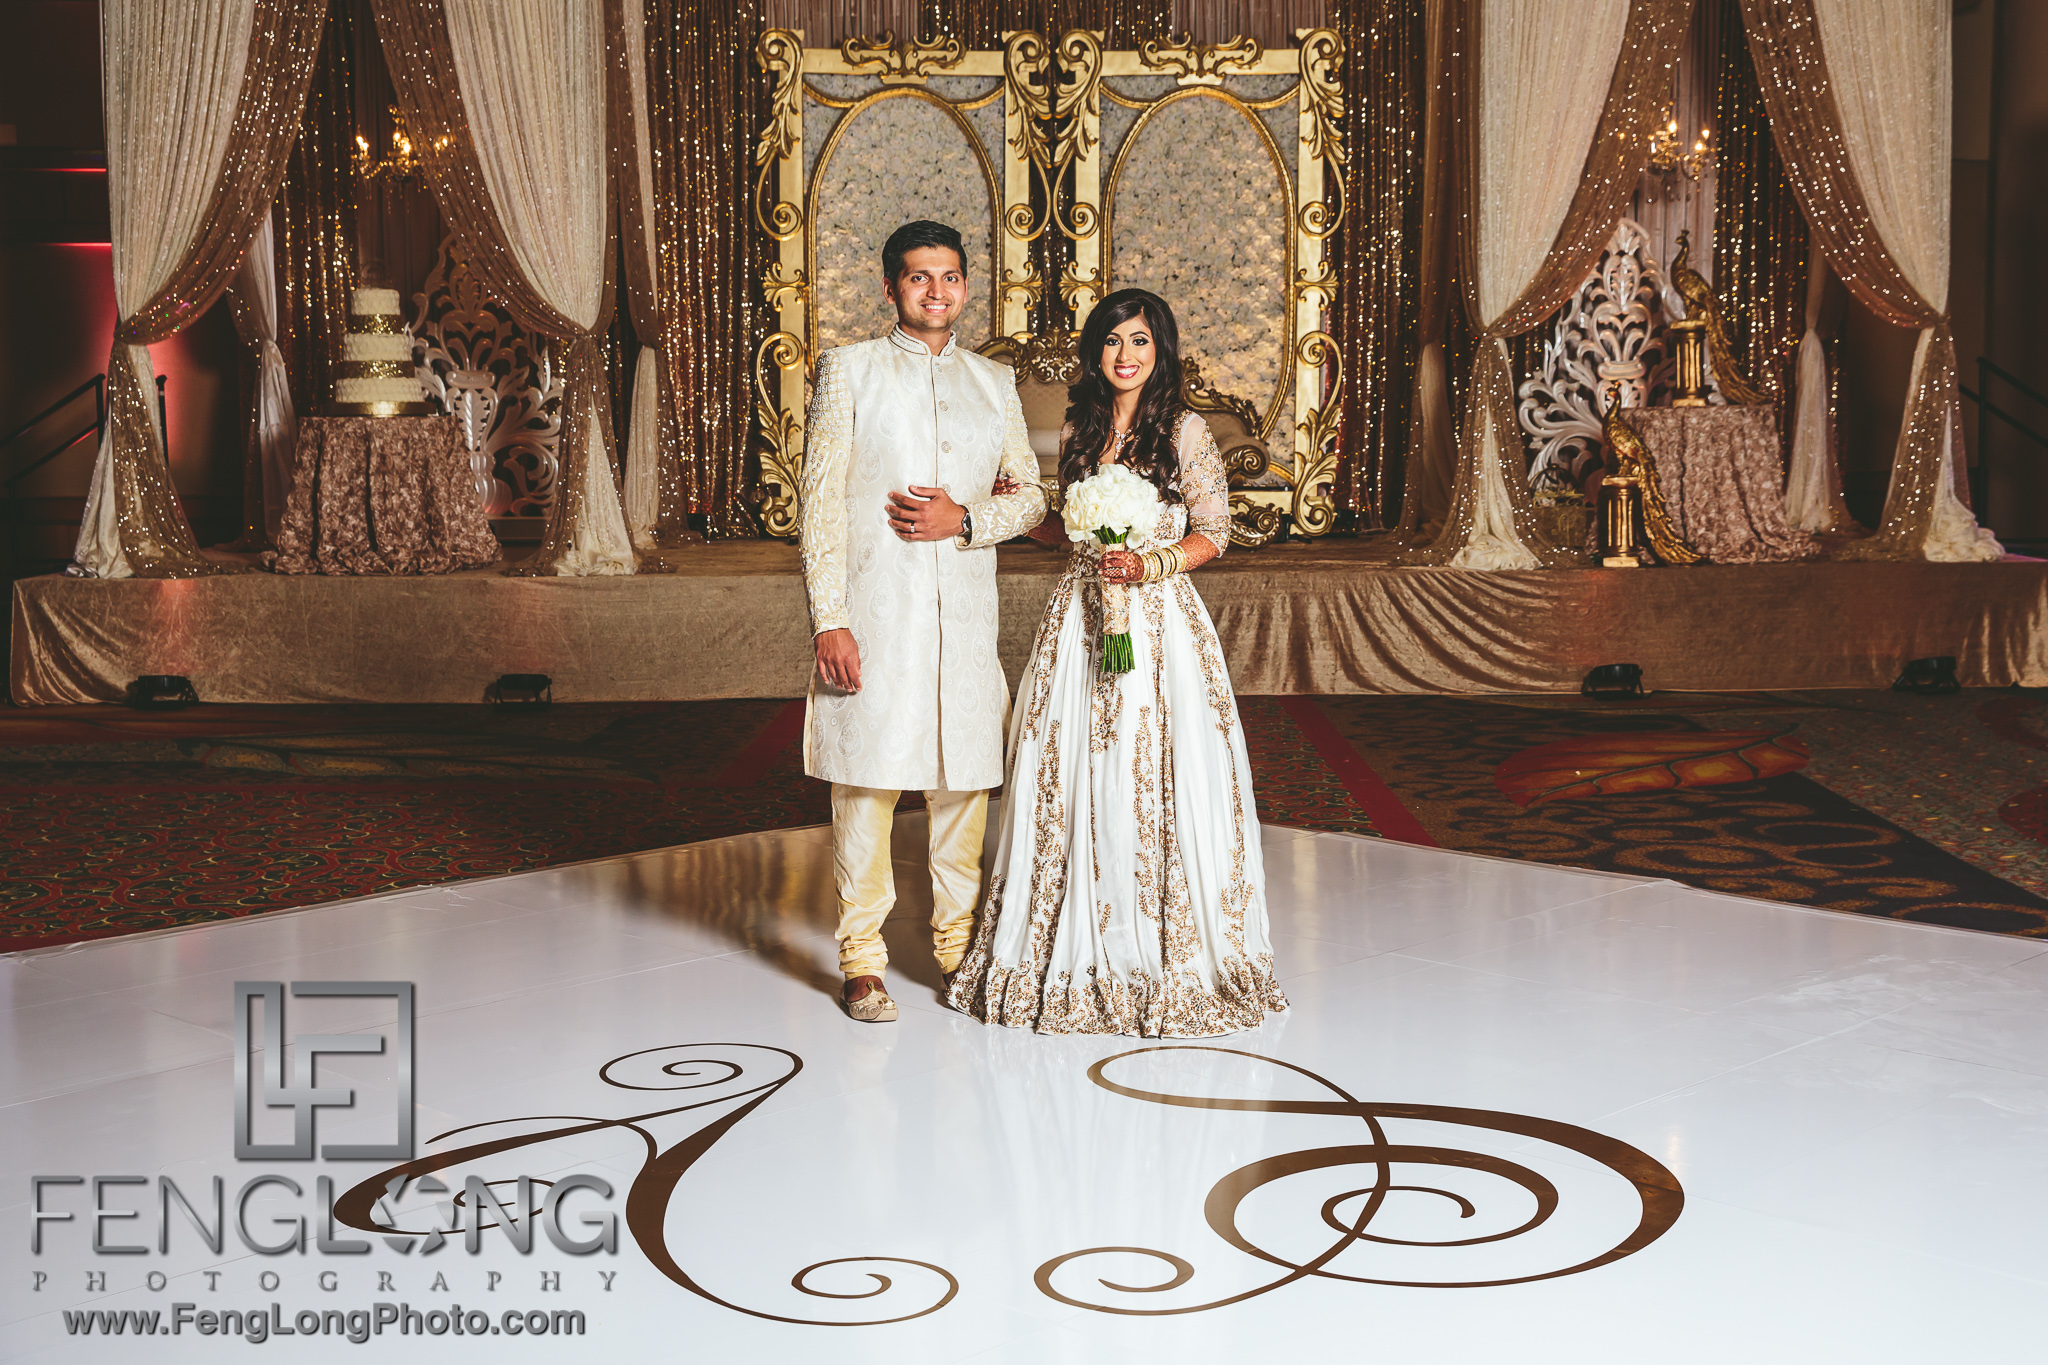 atlanta-indian-wedding-nikkah-reception-crowne-plaza-324080